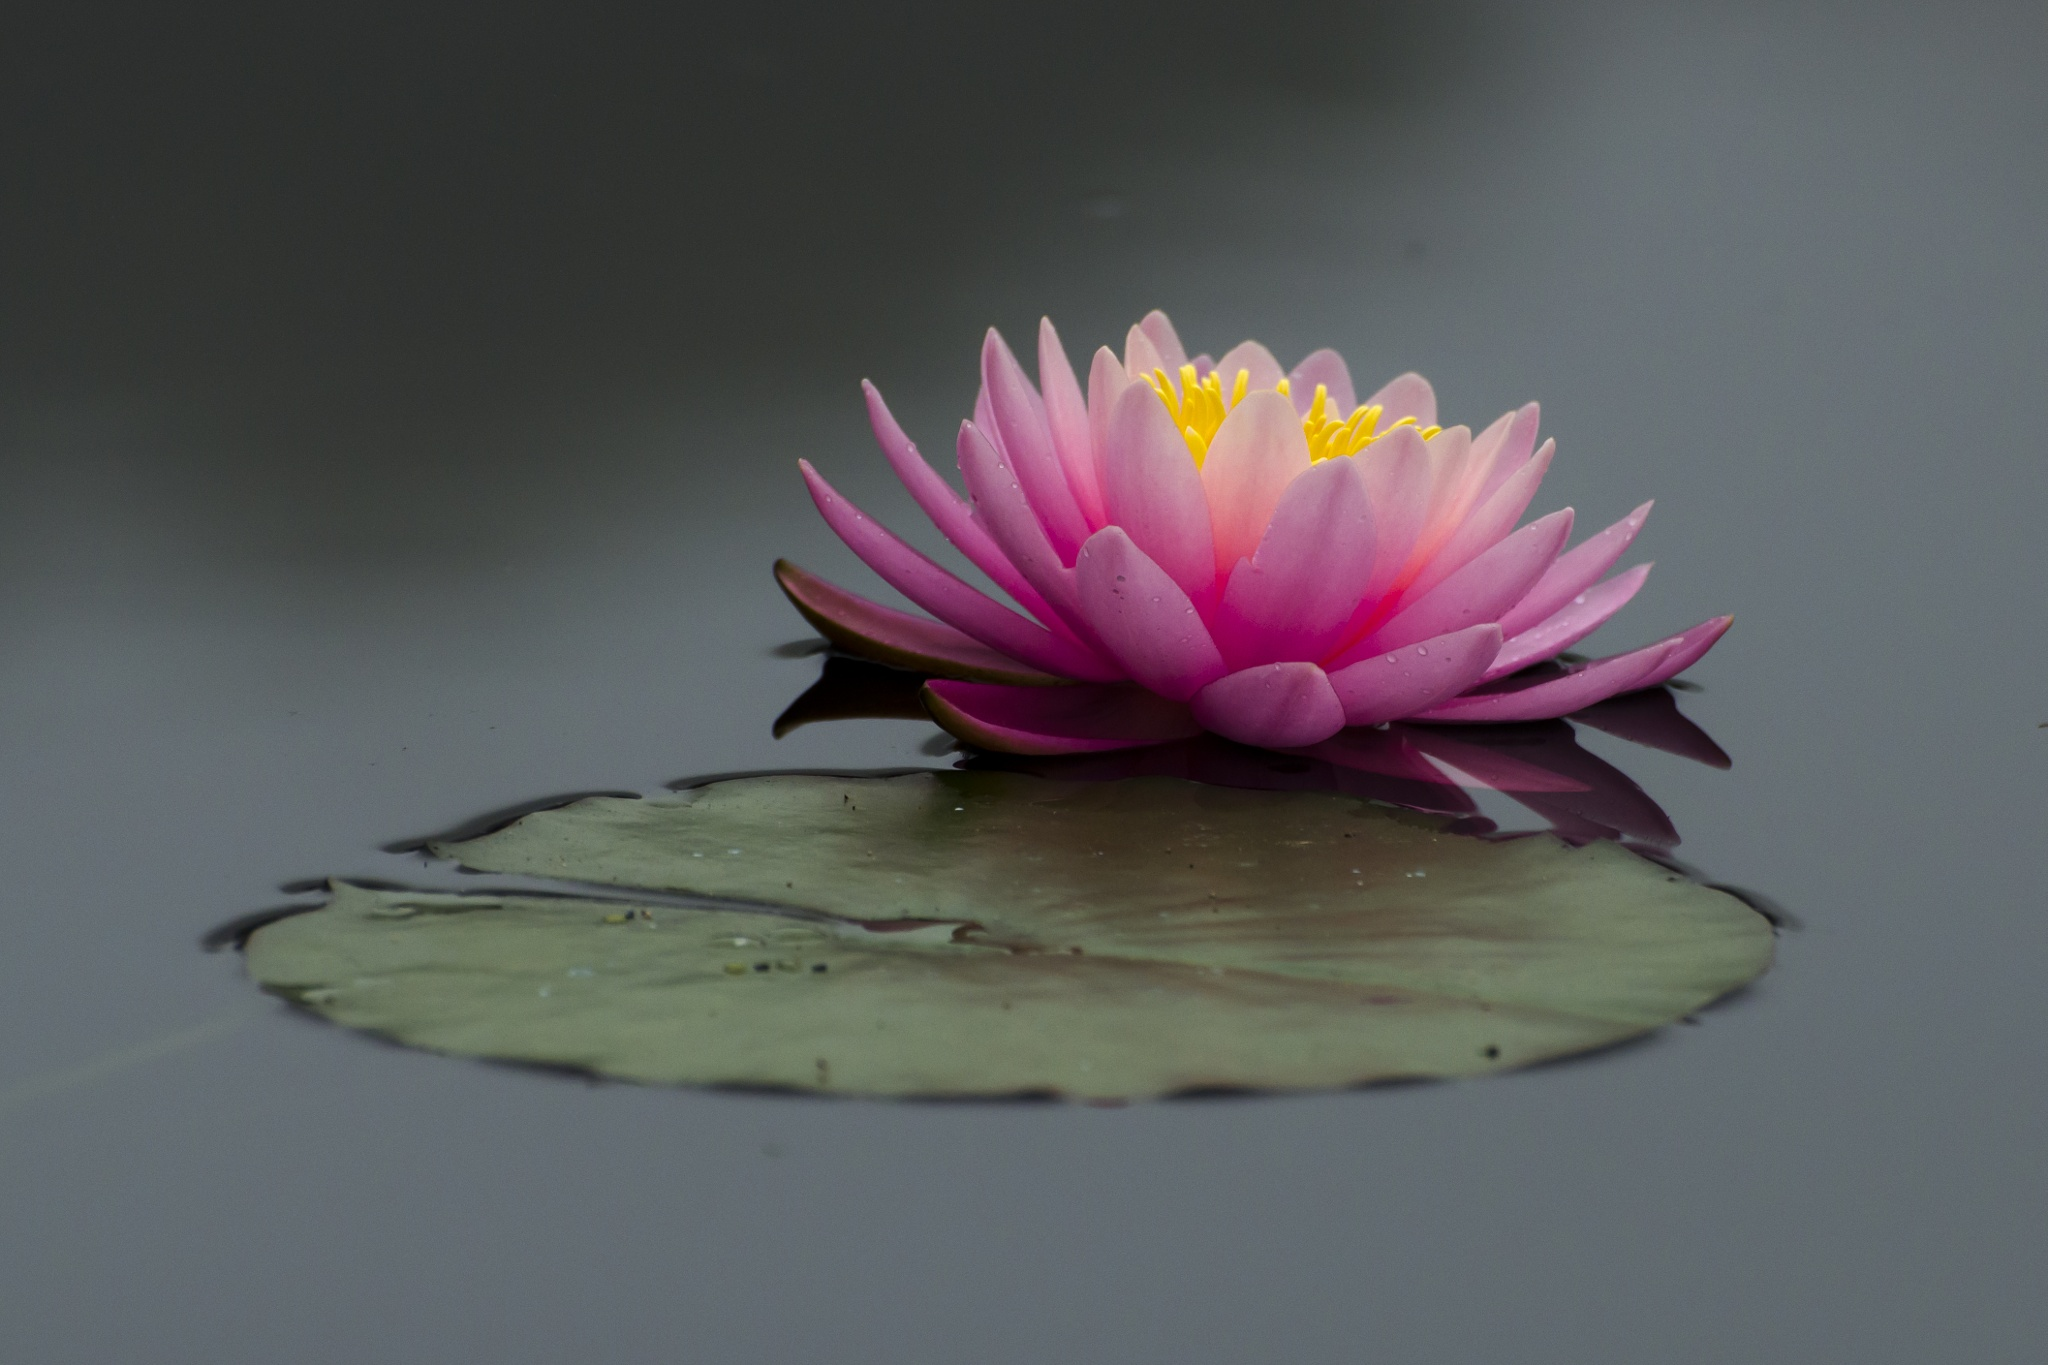 Aquatic Flower by jcarloscmonteiro